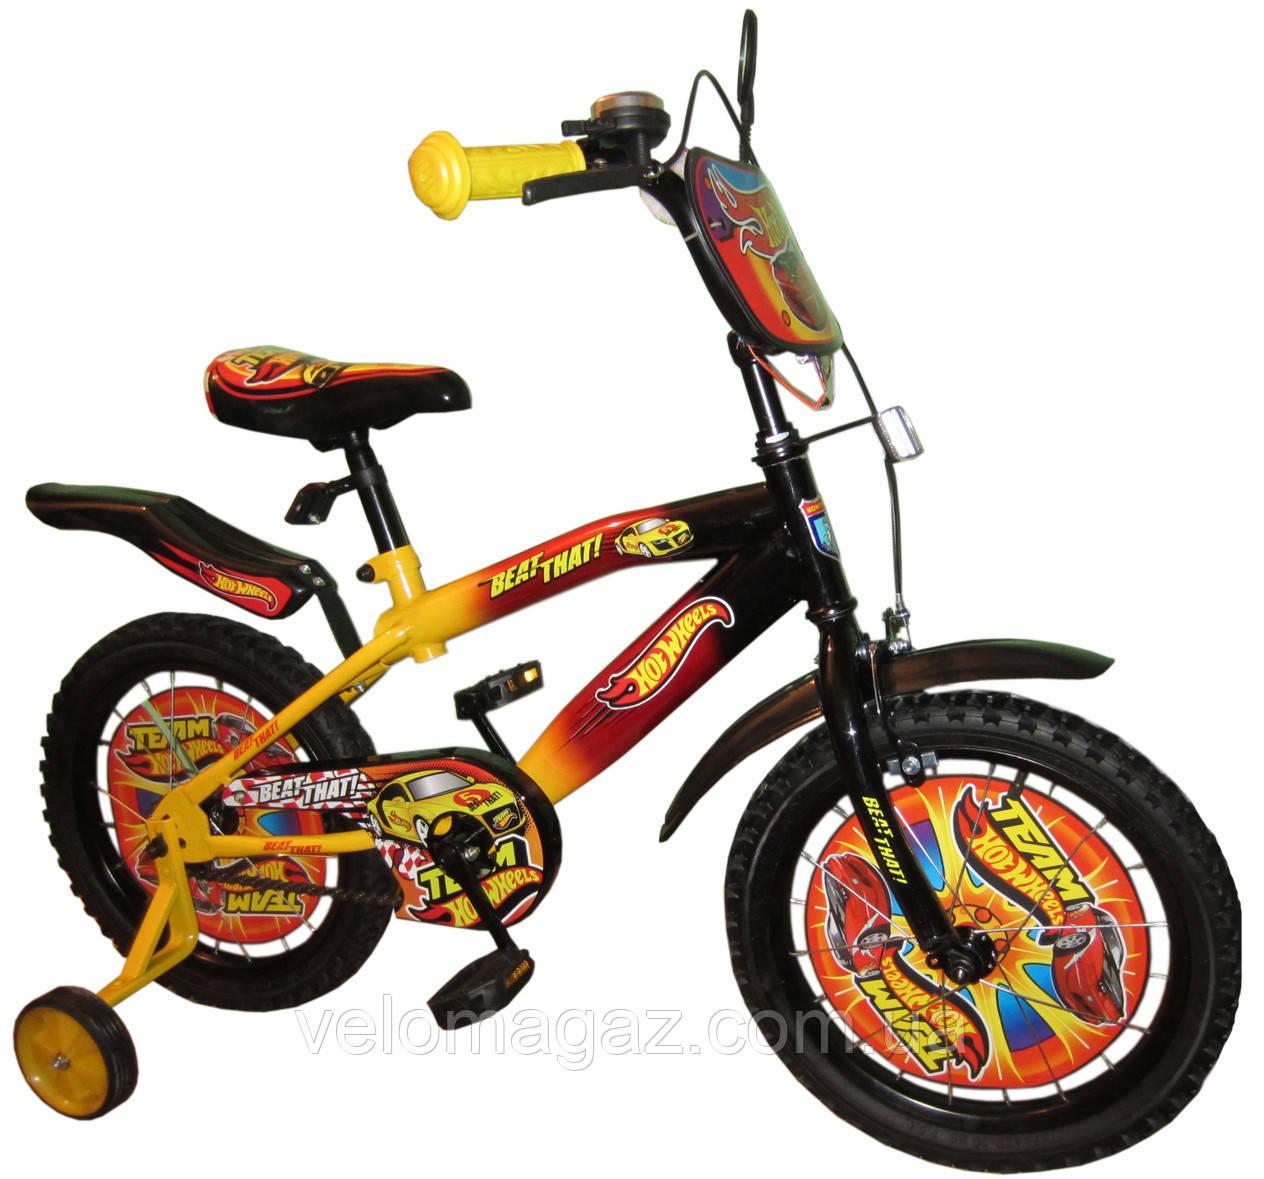 HOTWHEELS 18 дитячий велосипед